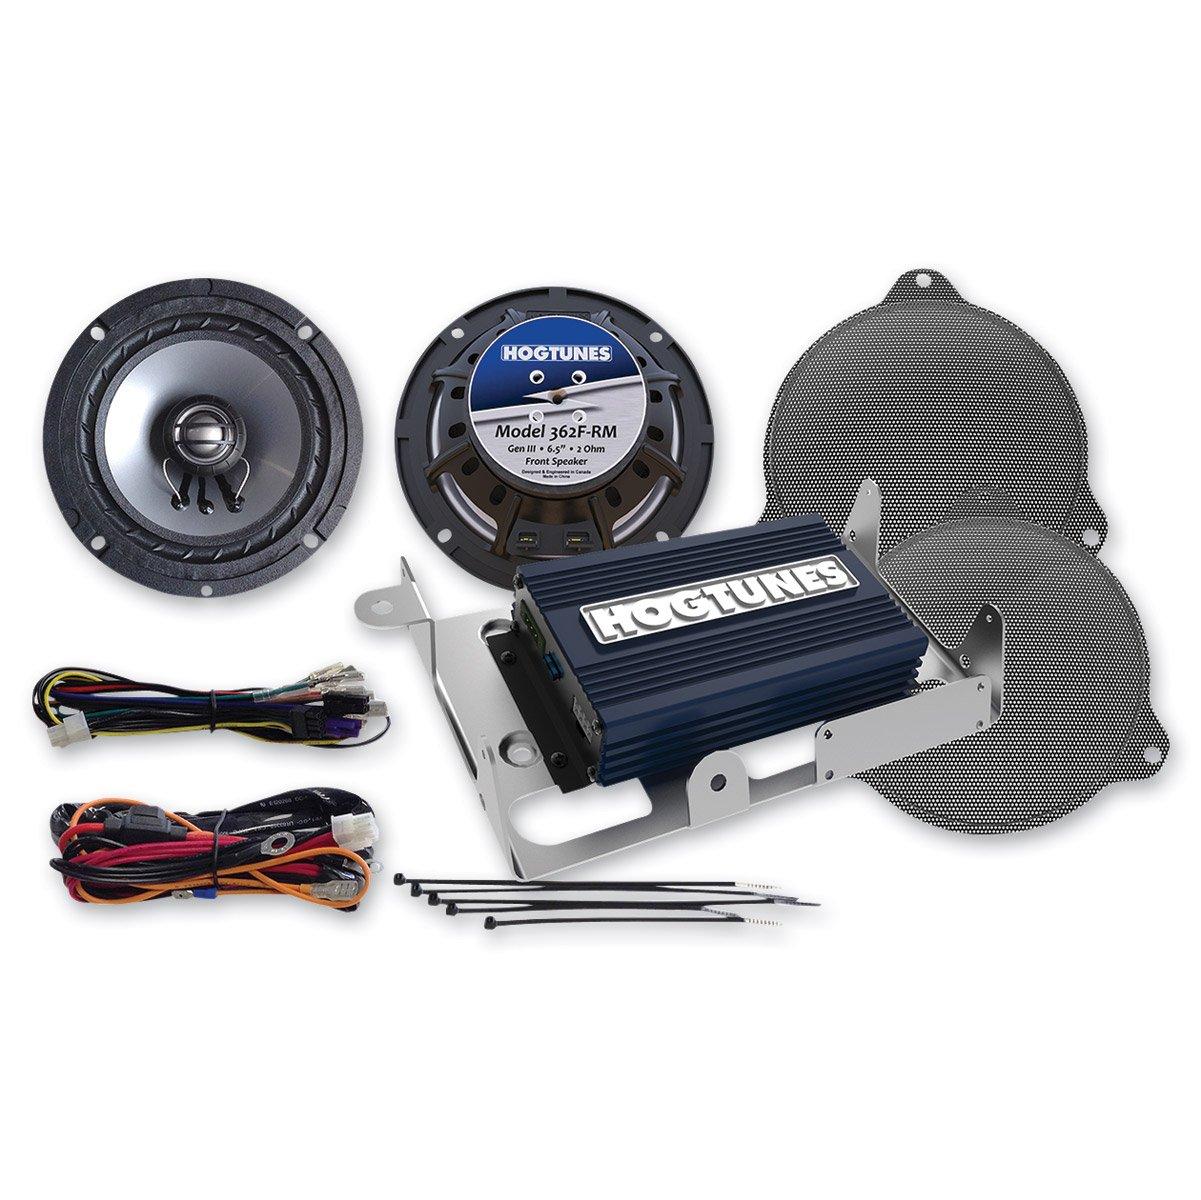 Hogtunes Sound System | www.topsimages.com